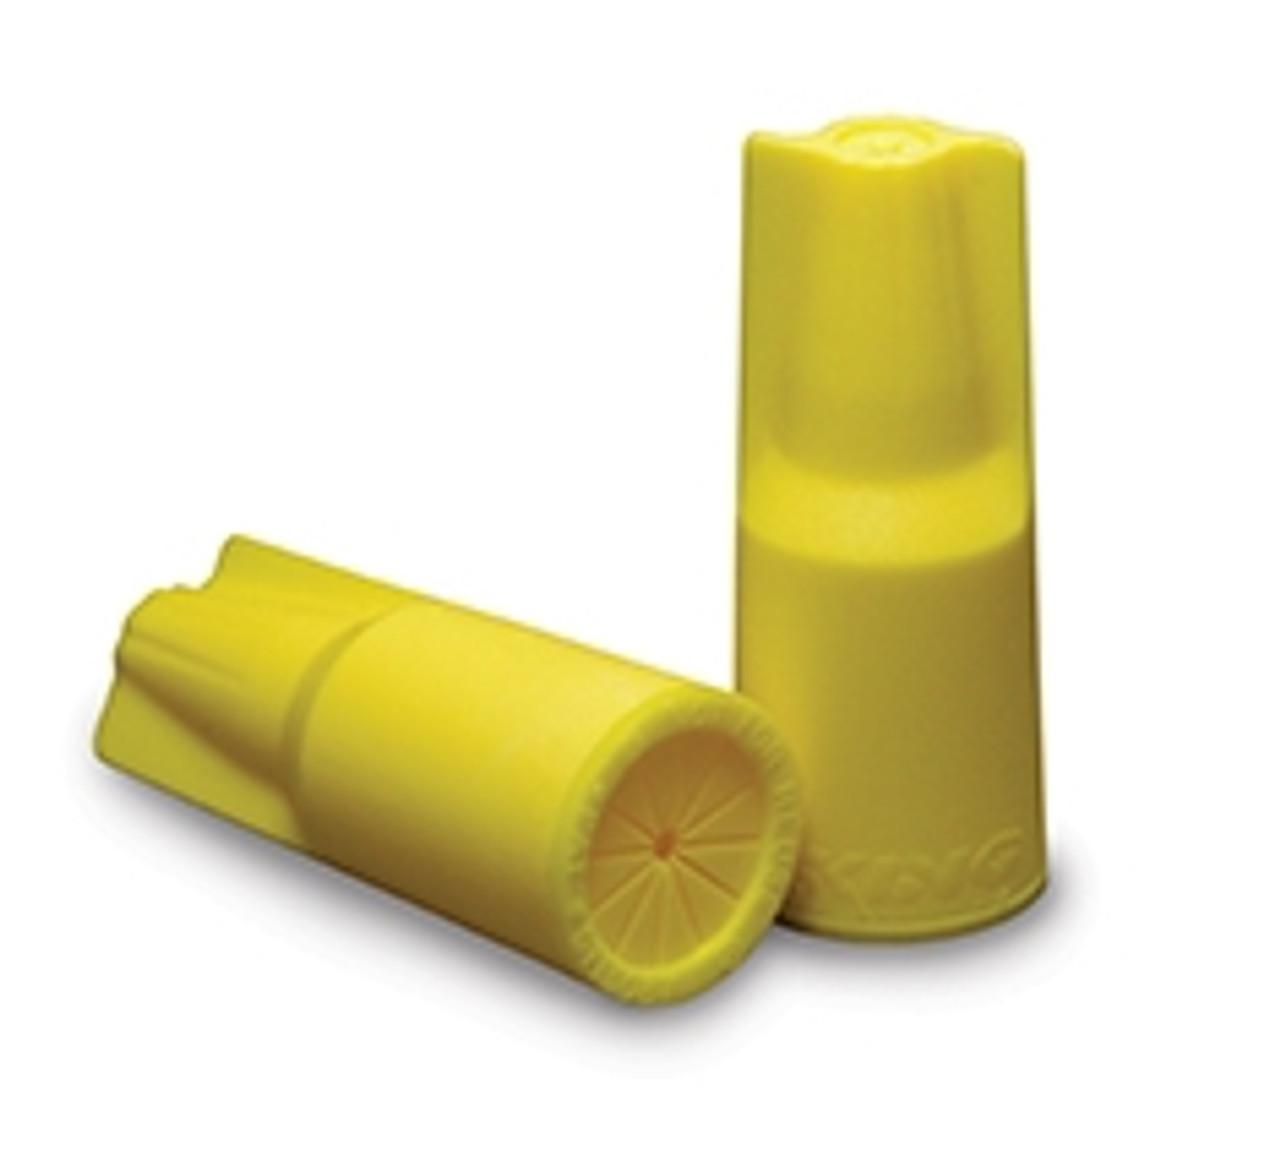 31556 - King 6 Yellow 10 pc. Bag